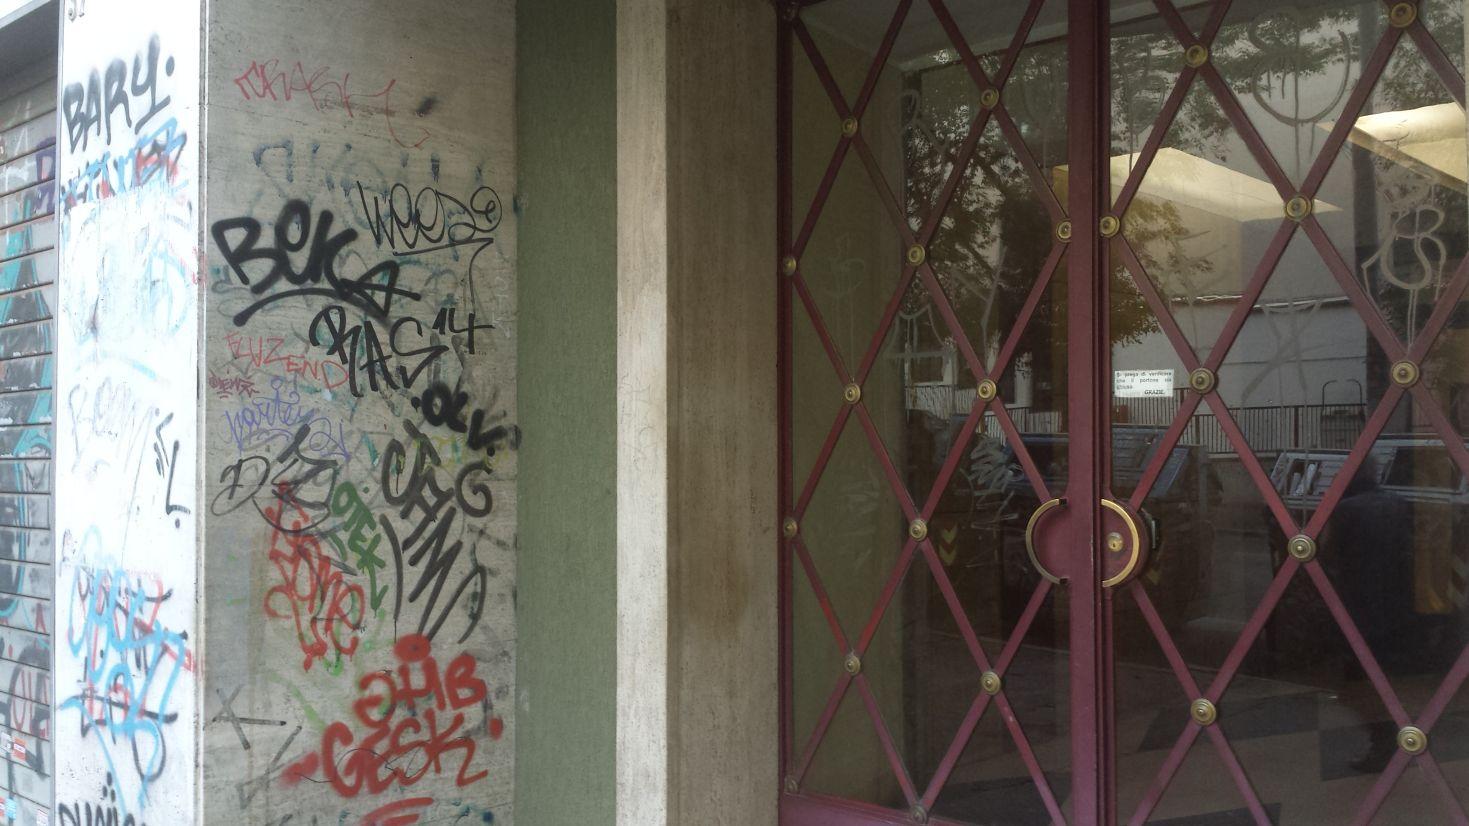 Via Gela graffiti 6